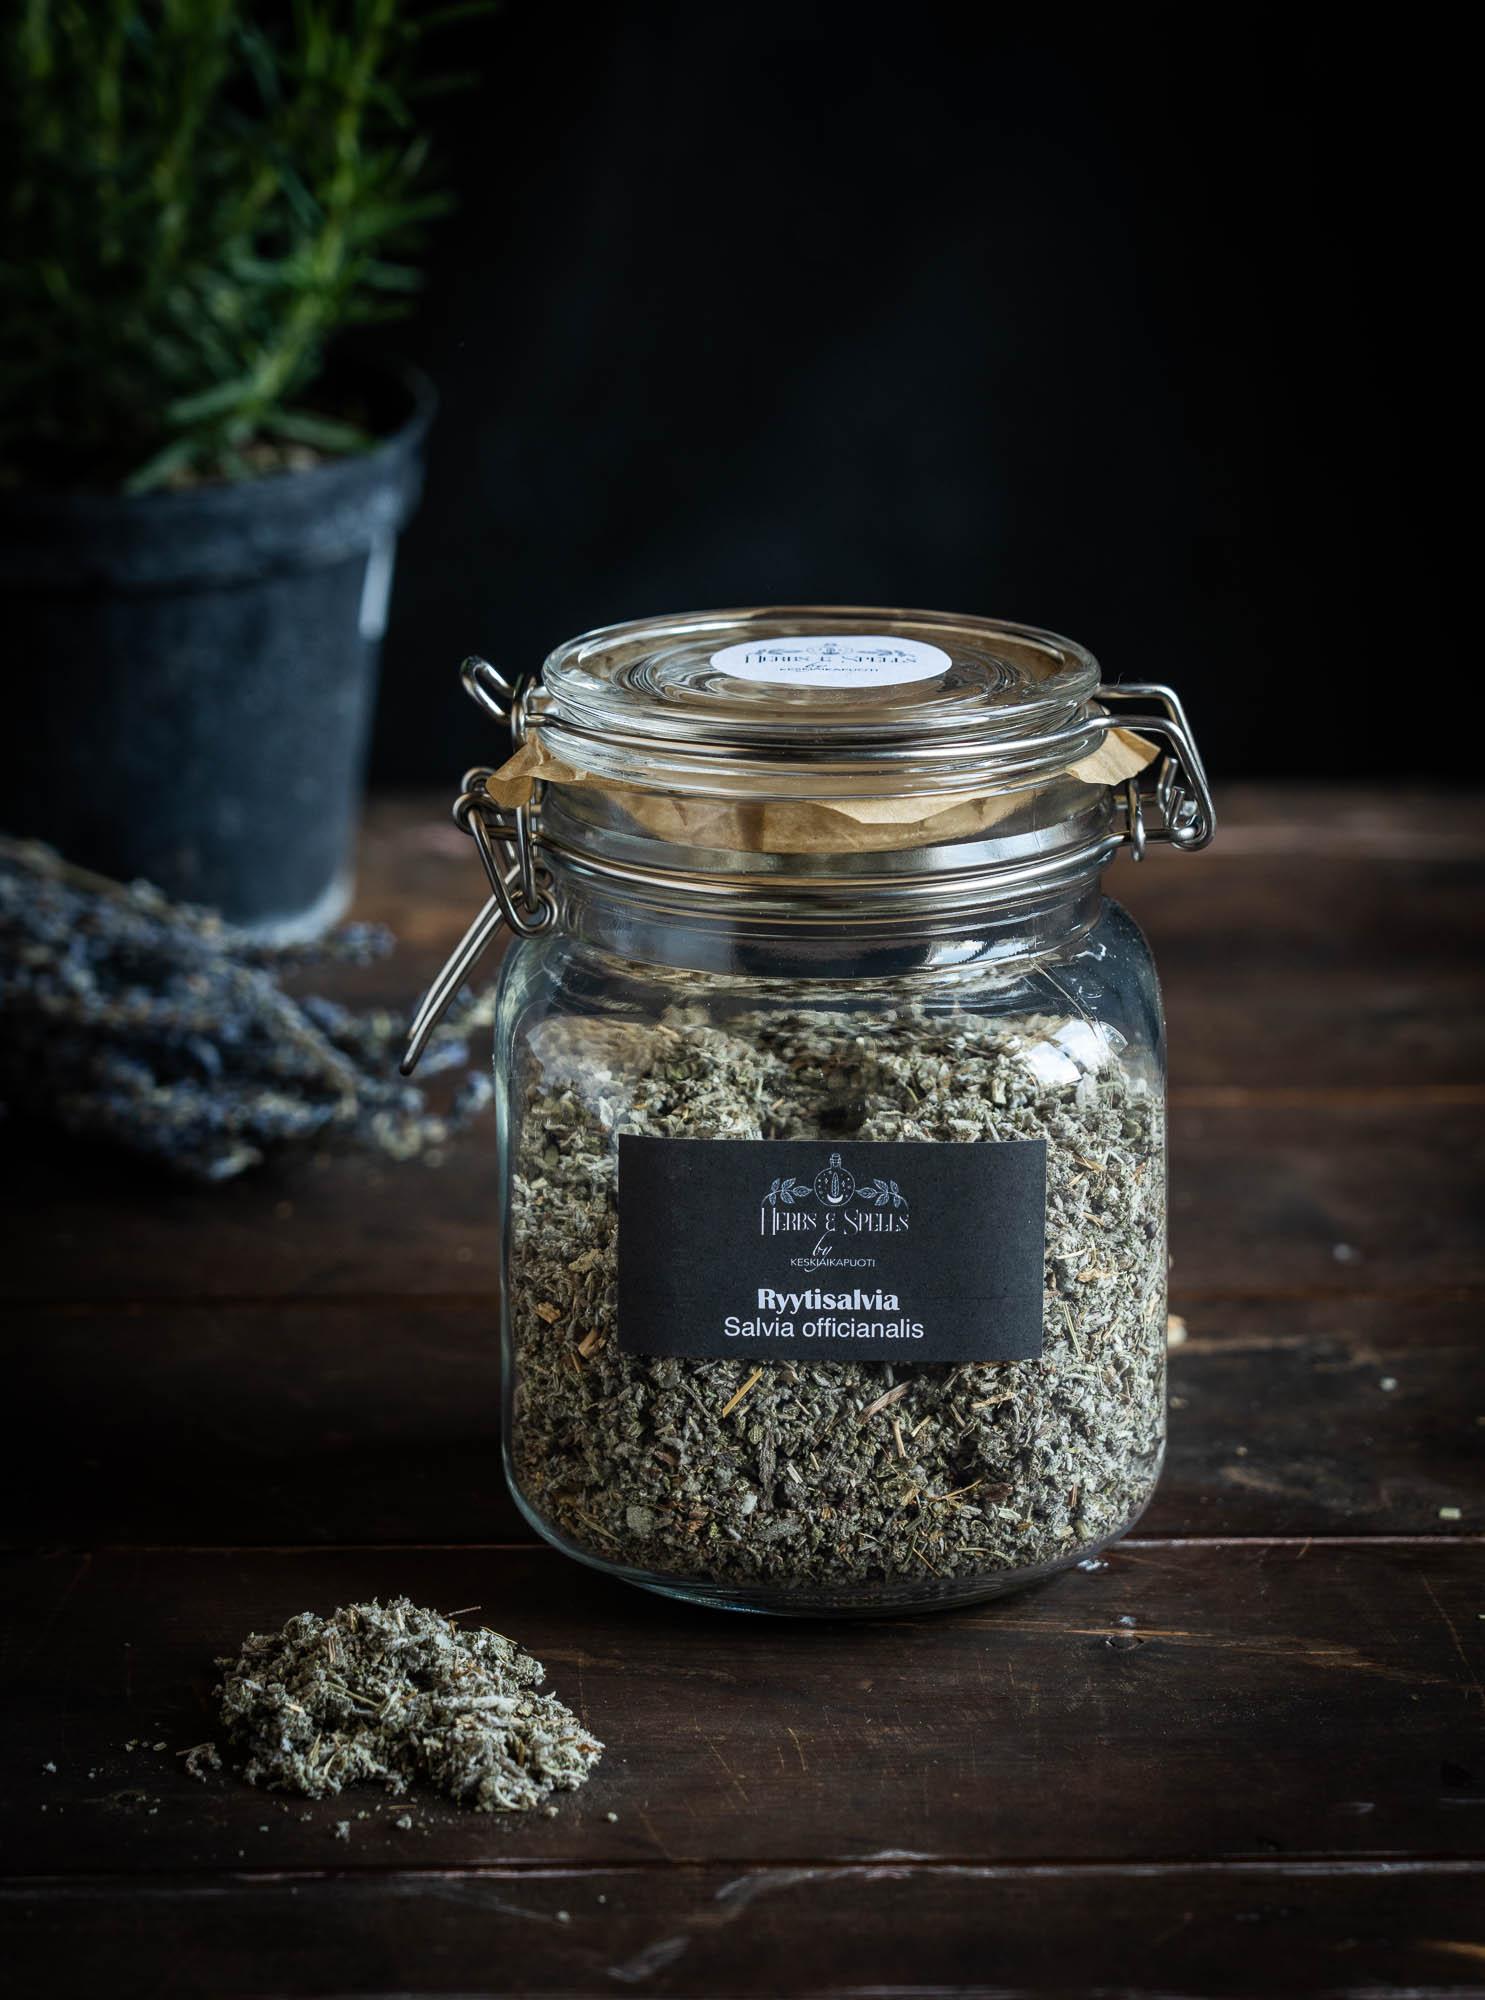 Ryytisalvia - Salvia officianalis (Herbs&Spell by keskiaikapuoti)